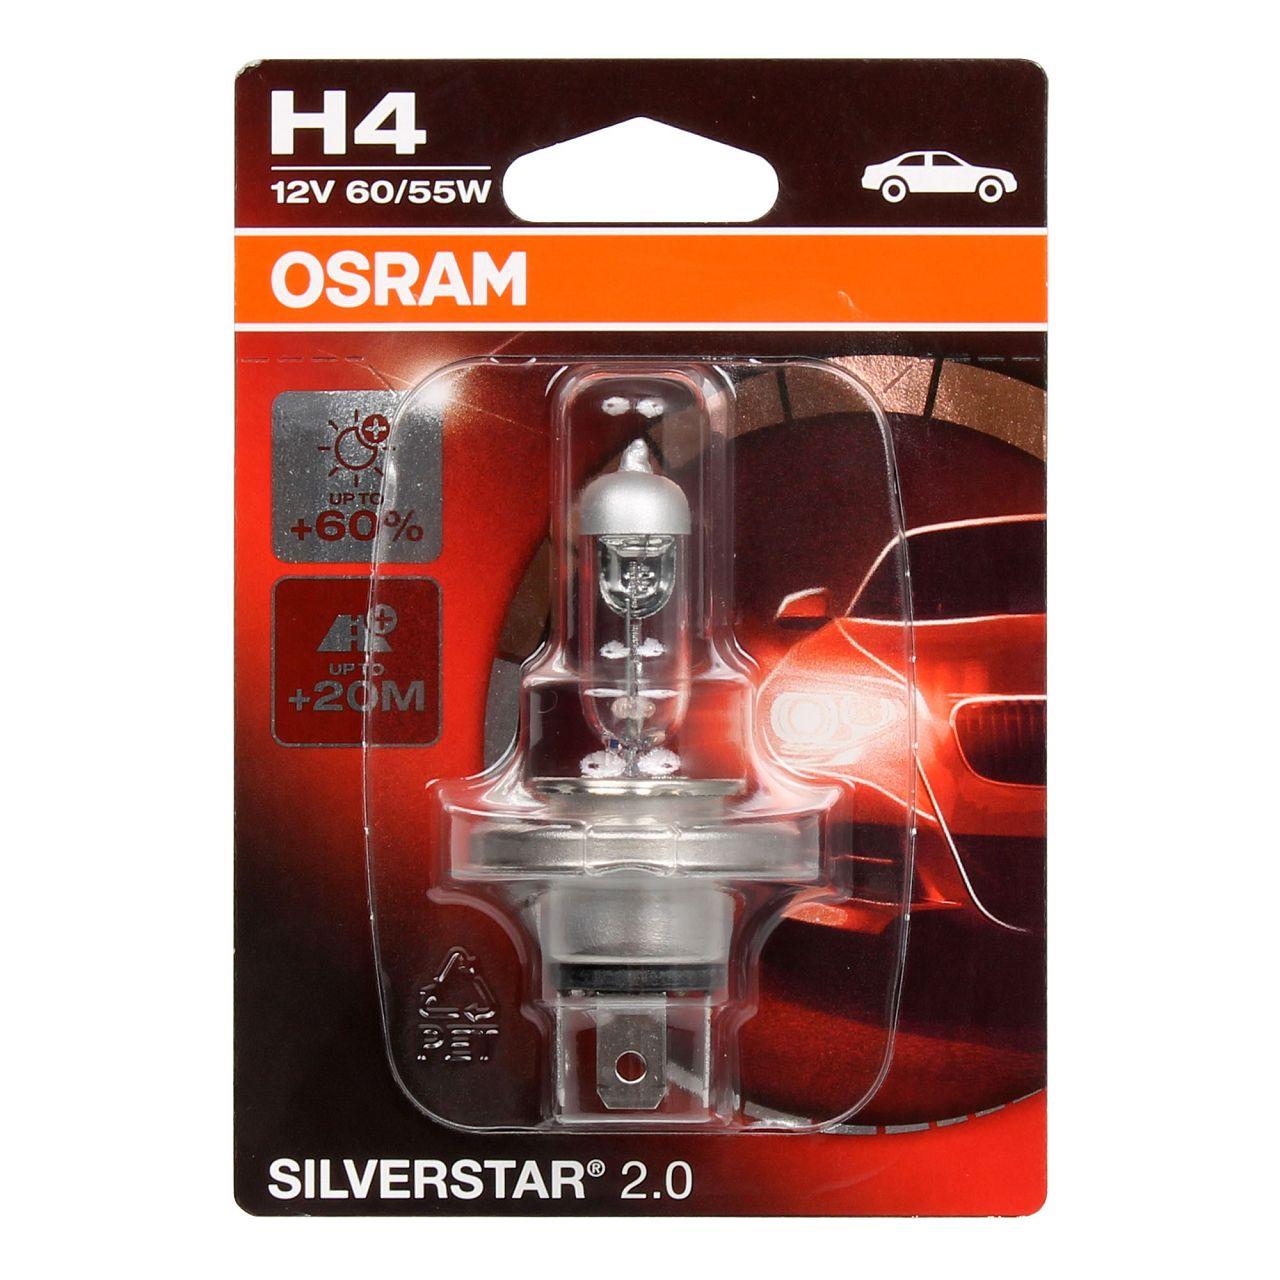 OSRAM Halogenlampe H4 SILVERSTAR 2.0 12V 60/55W P43t 64193SV2-01B